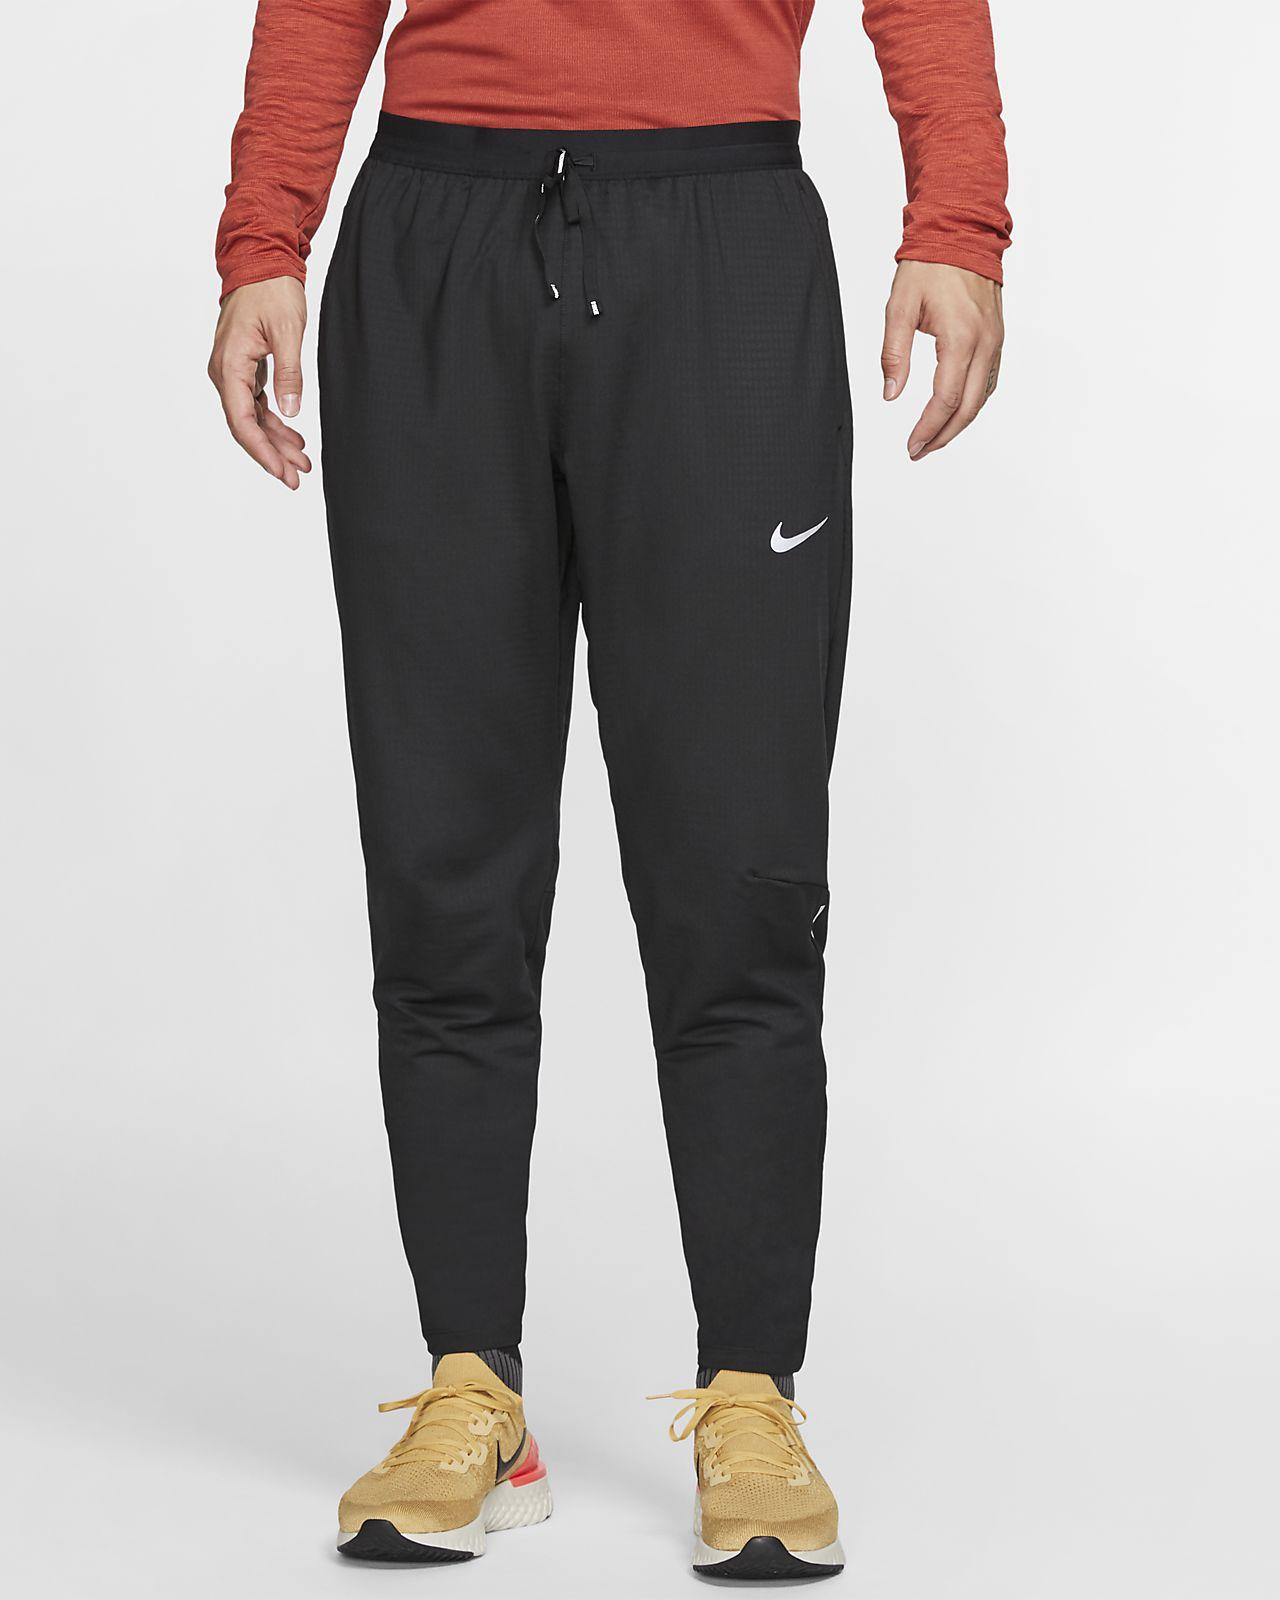 Nike Phenom Pantalons de teixit Knit de running - Home